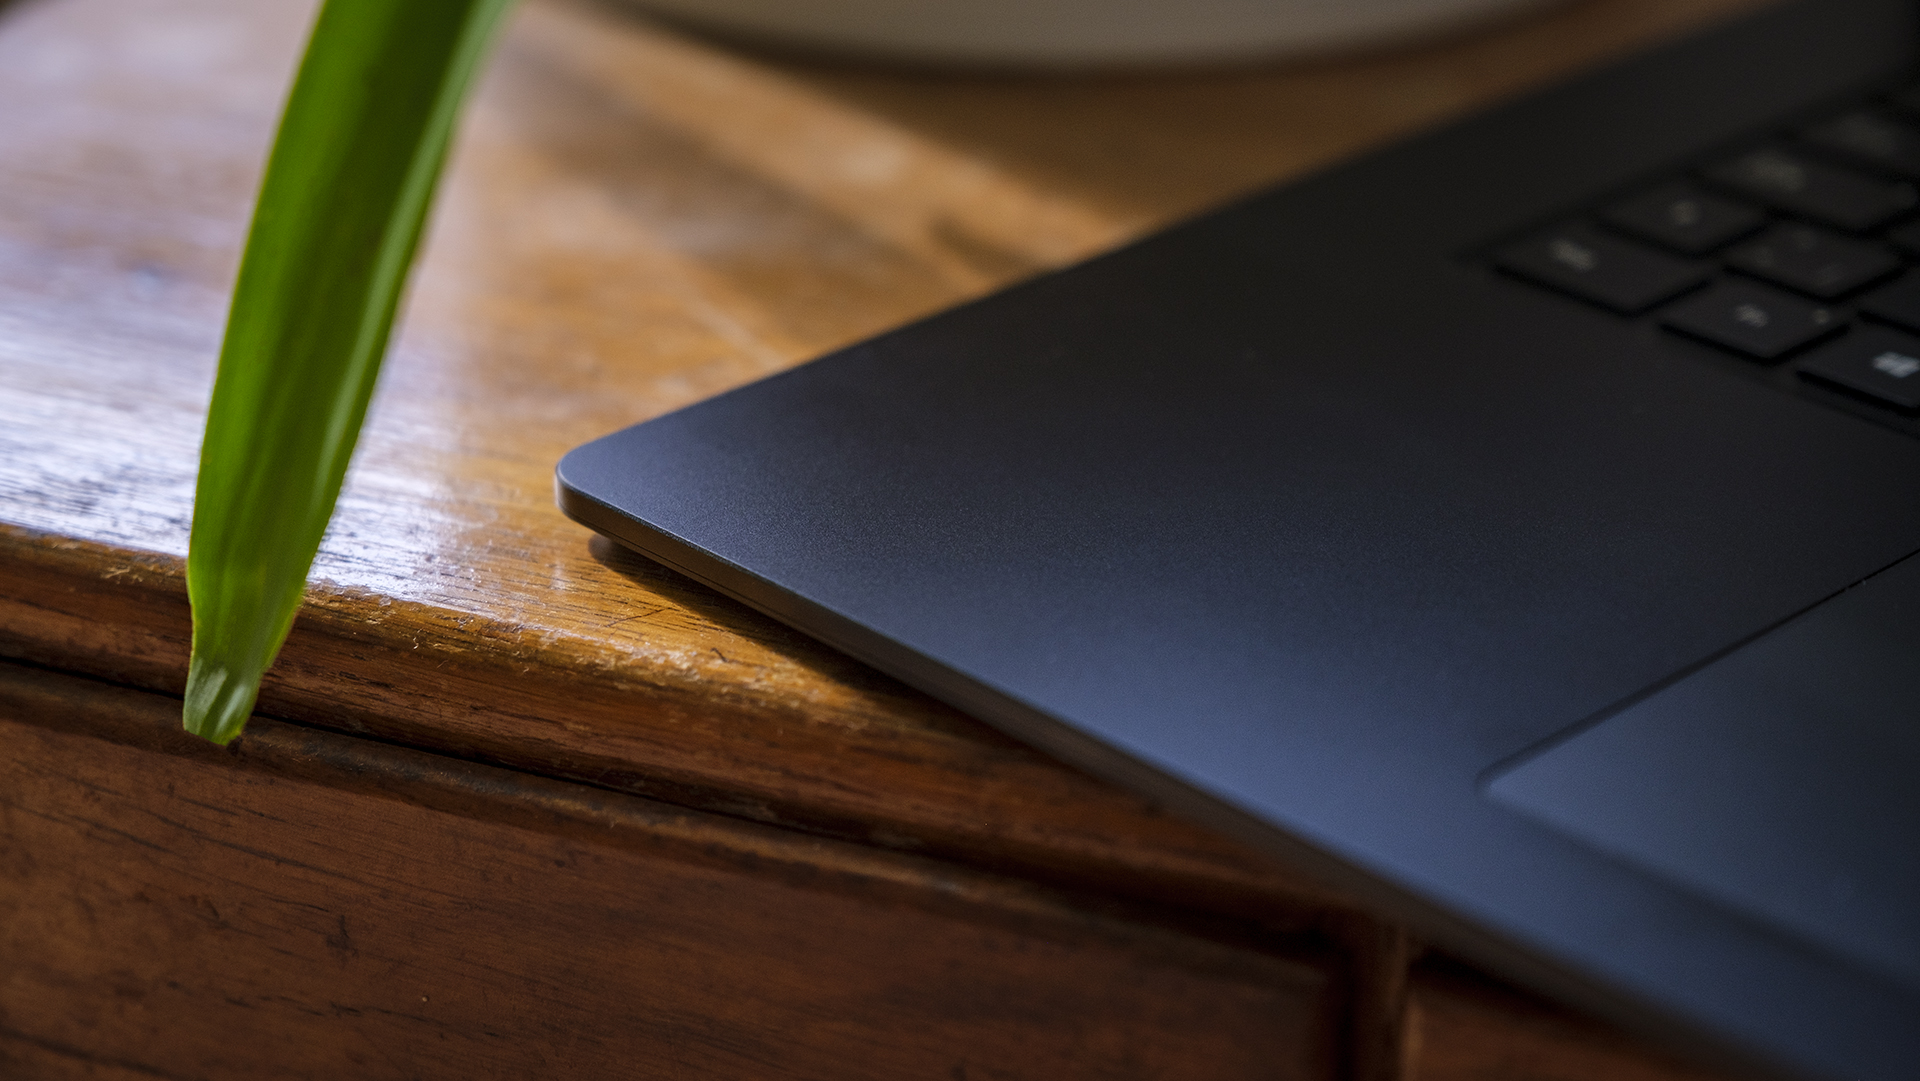 Microsoft Surface Laptop 4 15 AMD Ryzen Detail Close Up